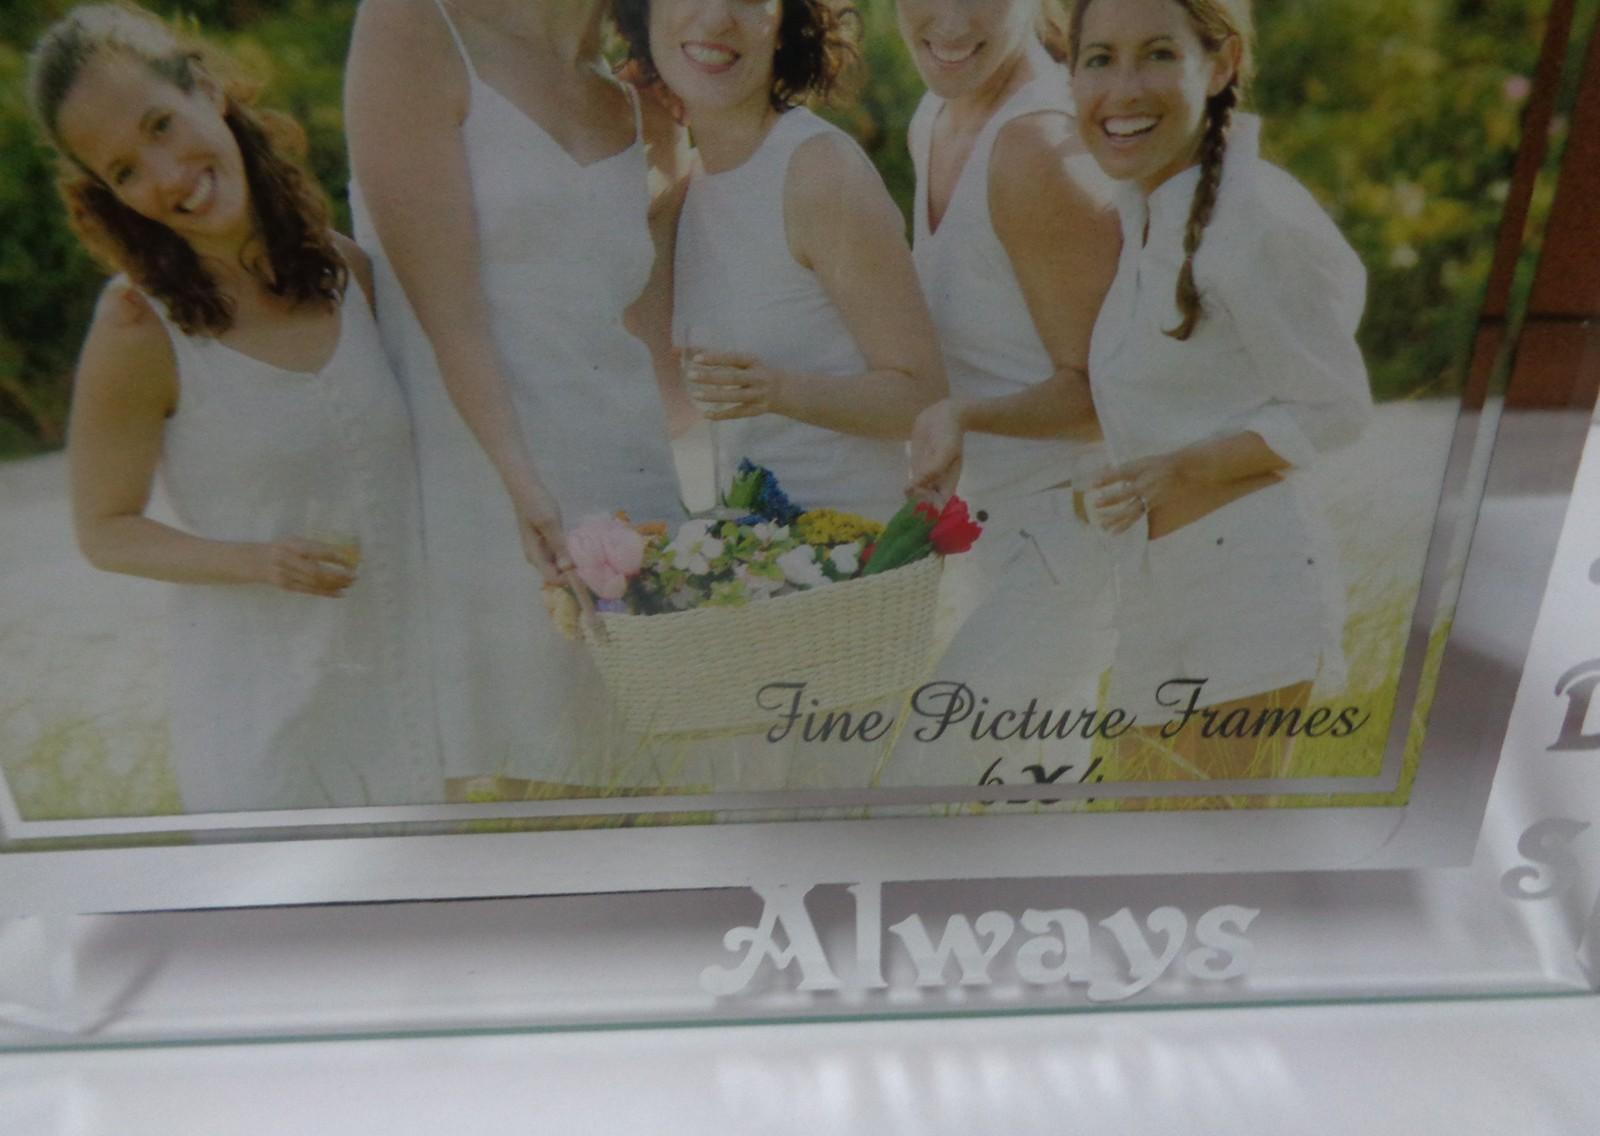 FRIENDS ALWAYS Etched Glass Photo Frame NWT 6 x 4 Photo